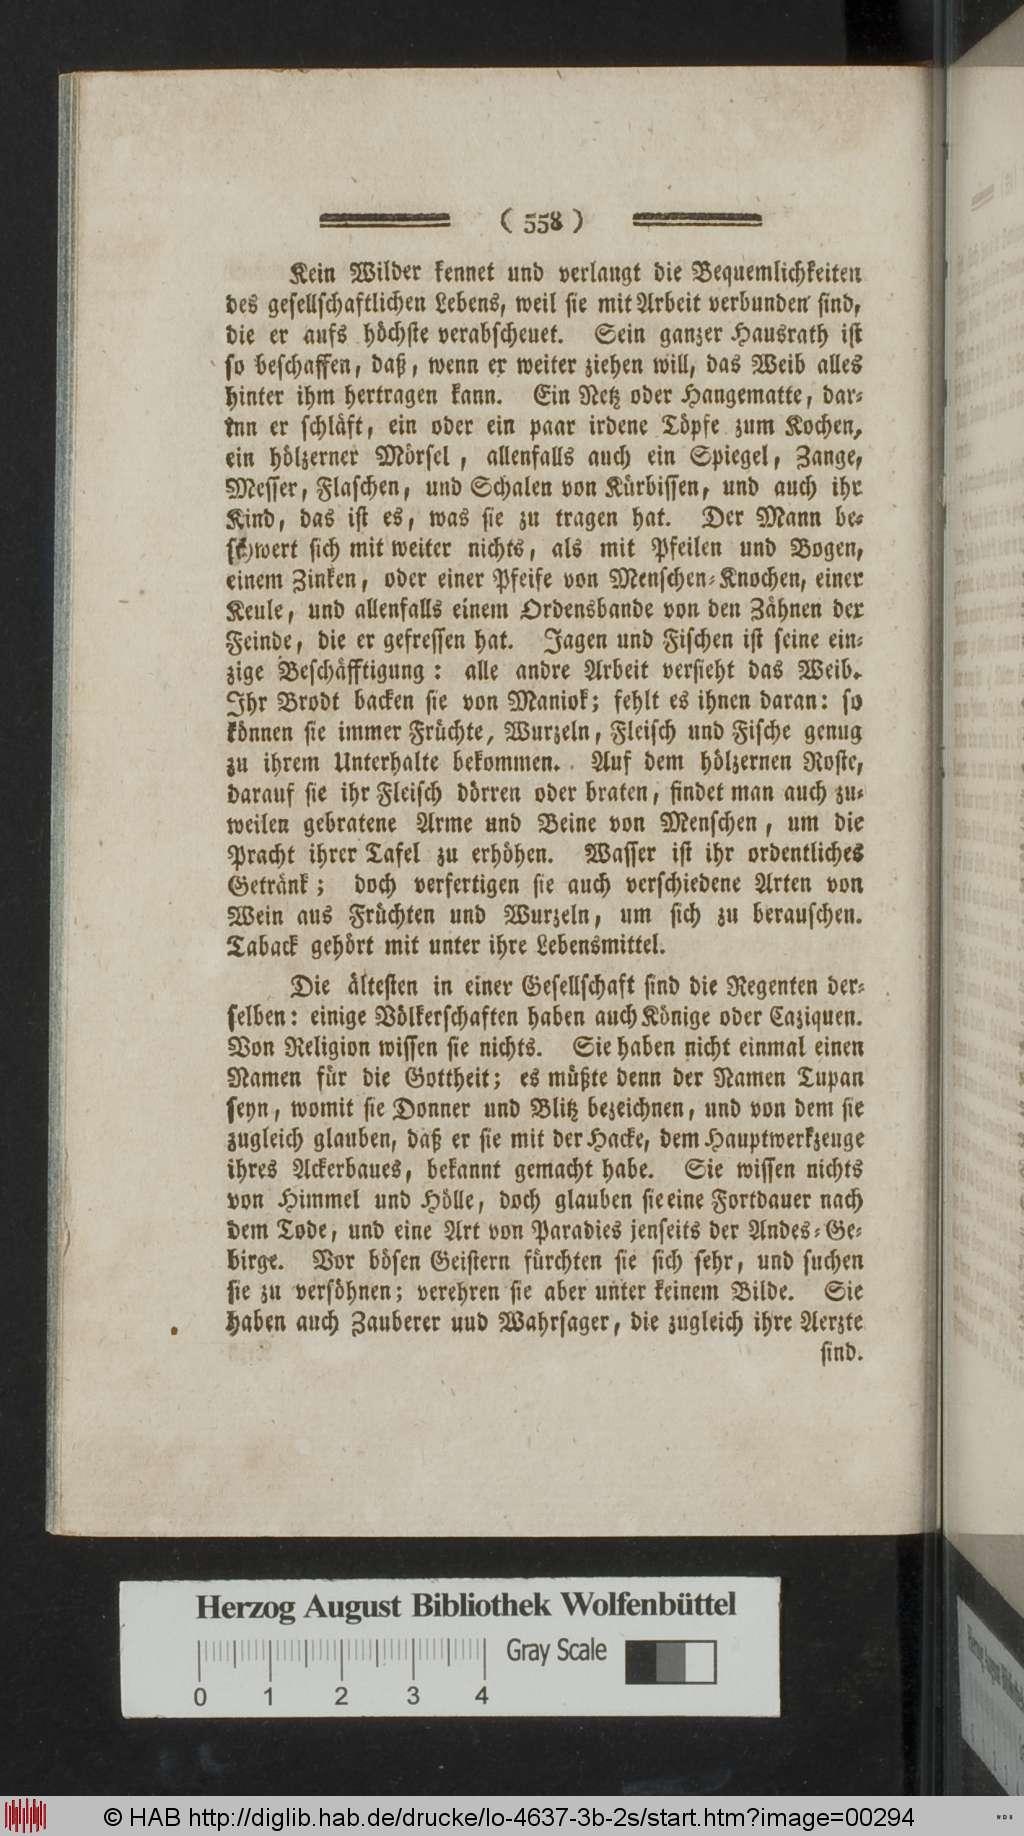 http://diglib.hab.de/drucke/lo-4637-3b-2s/00294.jpg